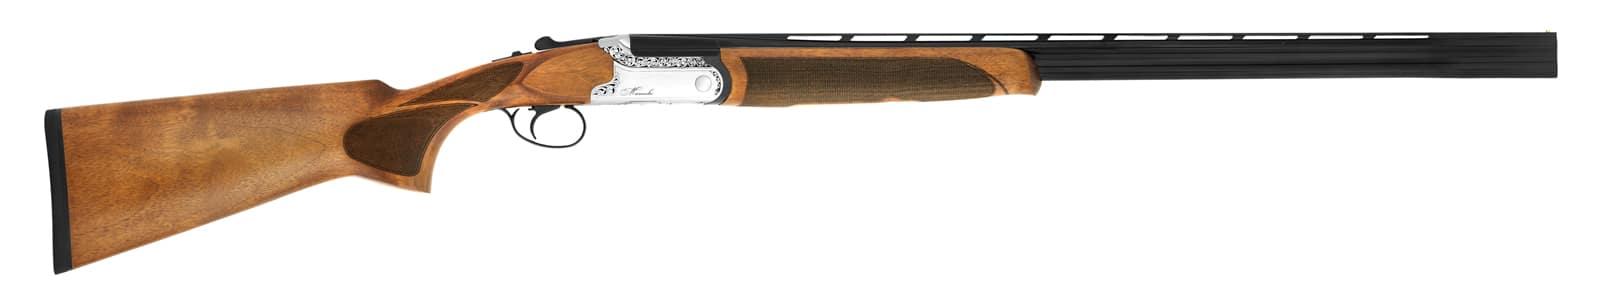 Fusil superposé MAROCCHI FIRST LUXE Cal. 20/76